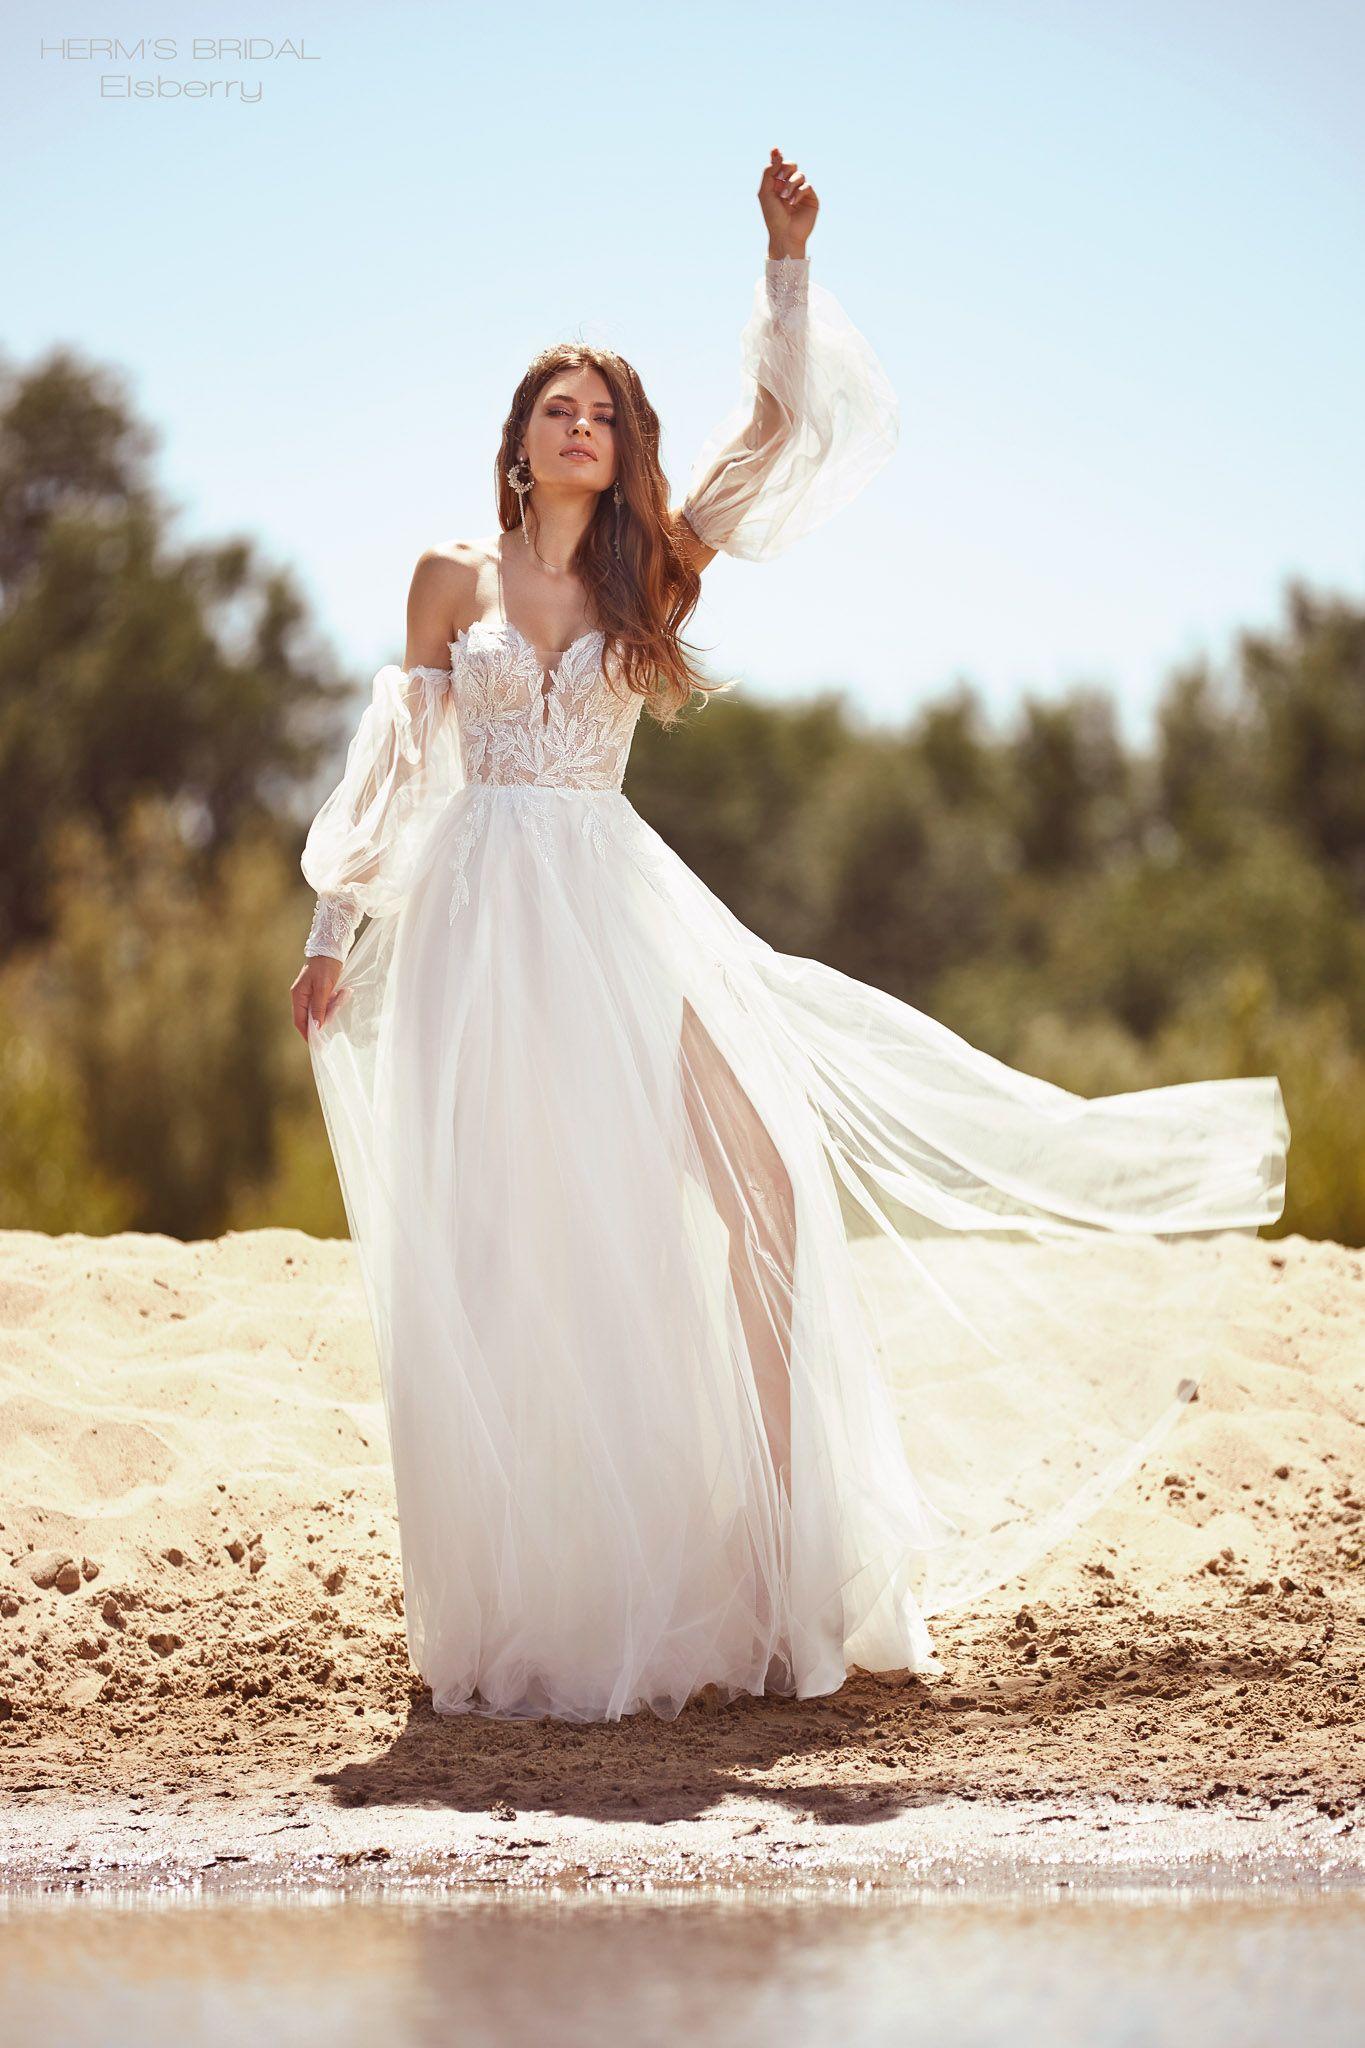 suknia slubna herms bridal Elsberyy